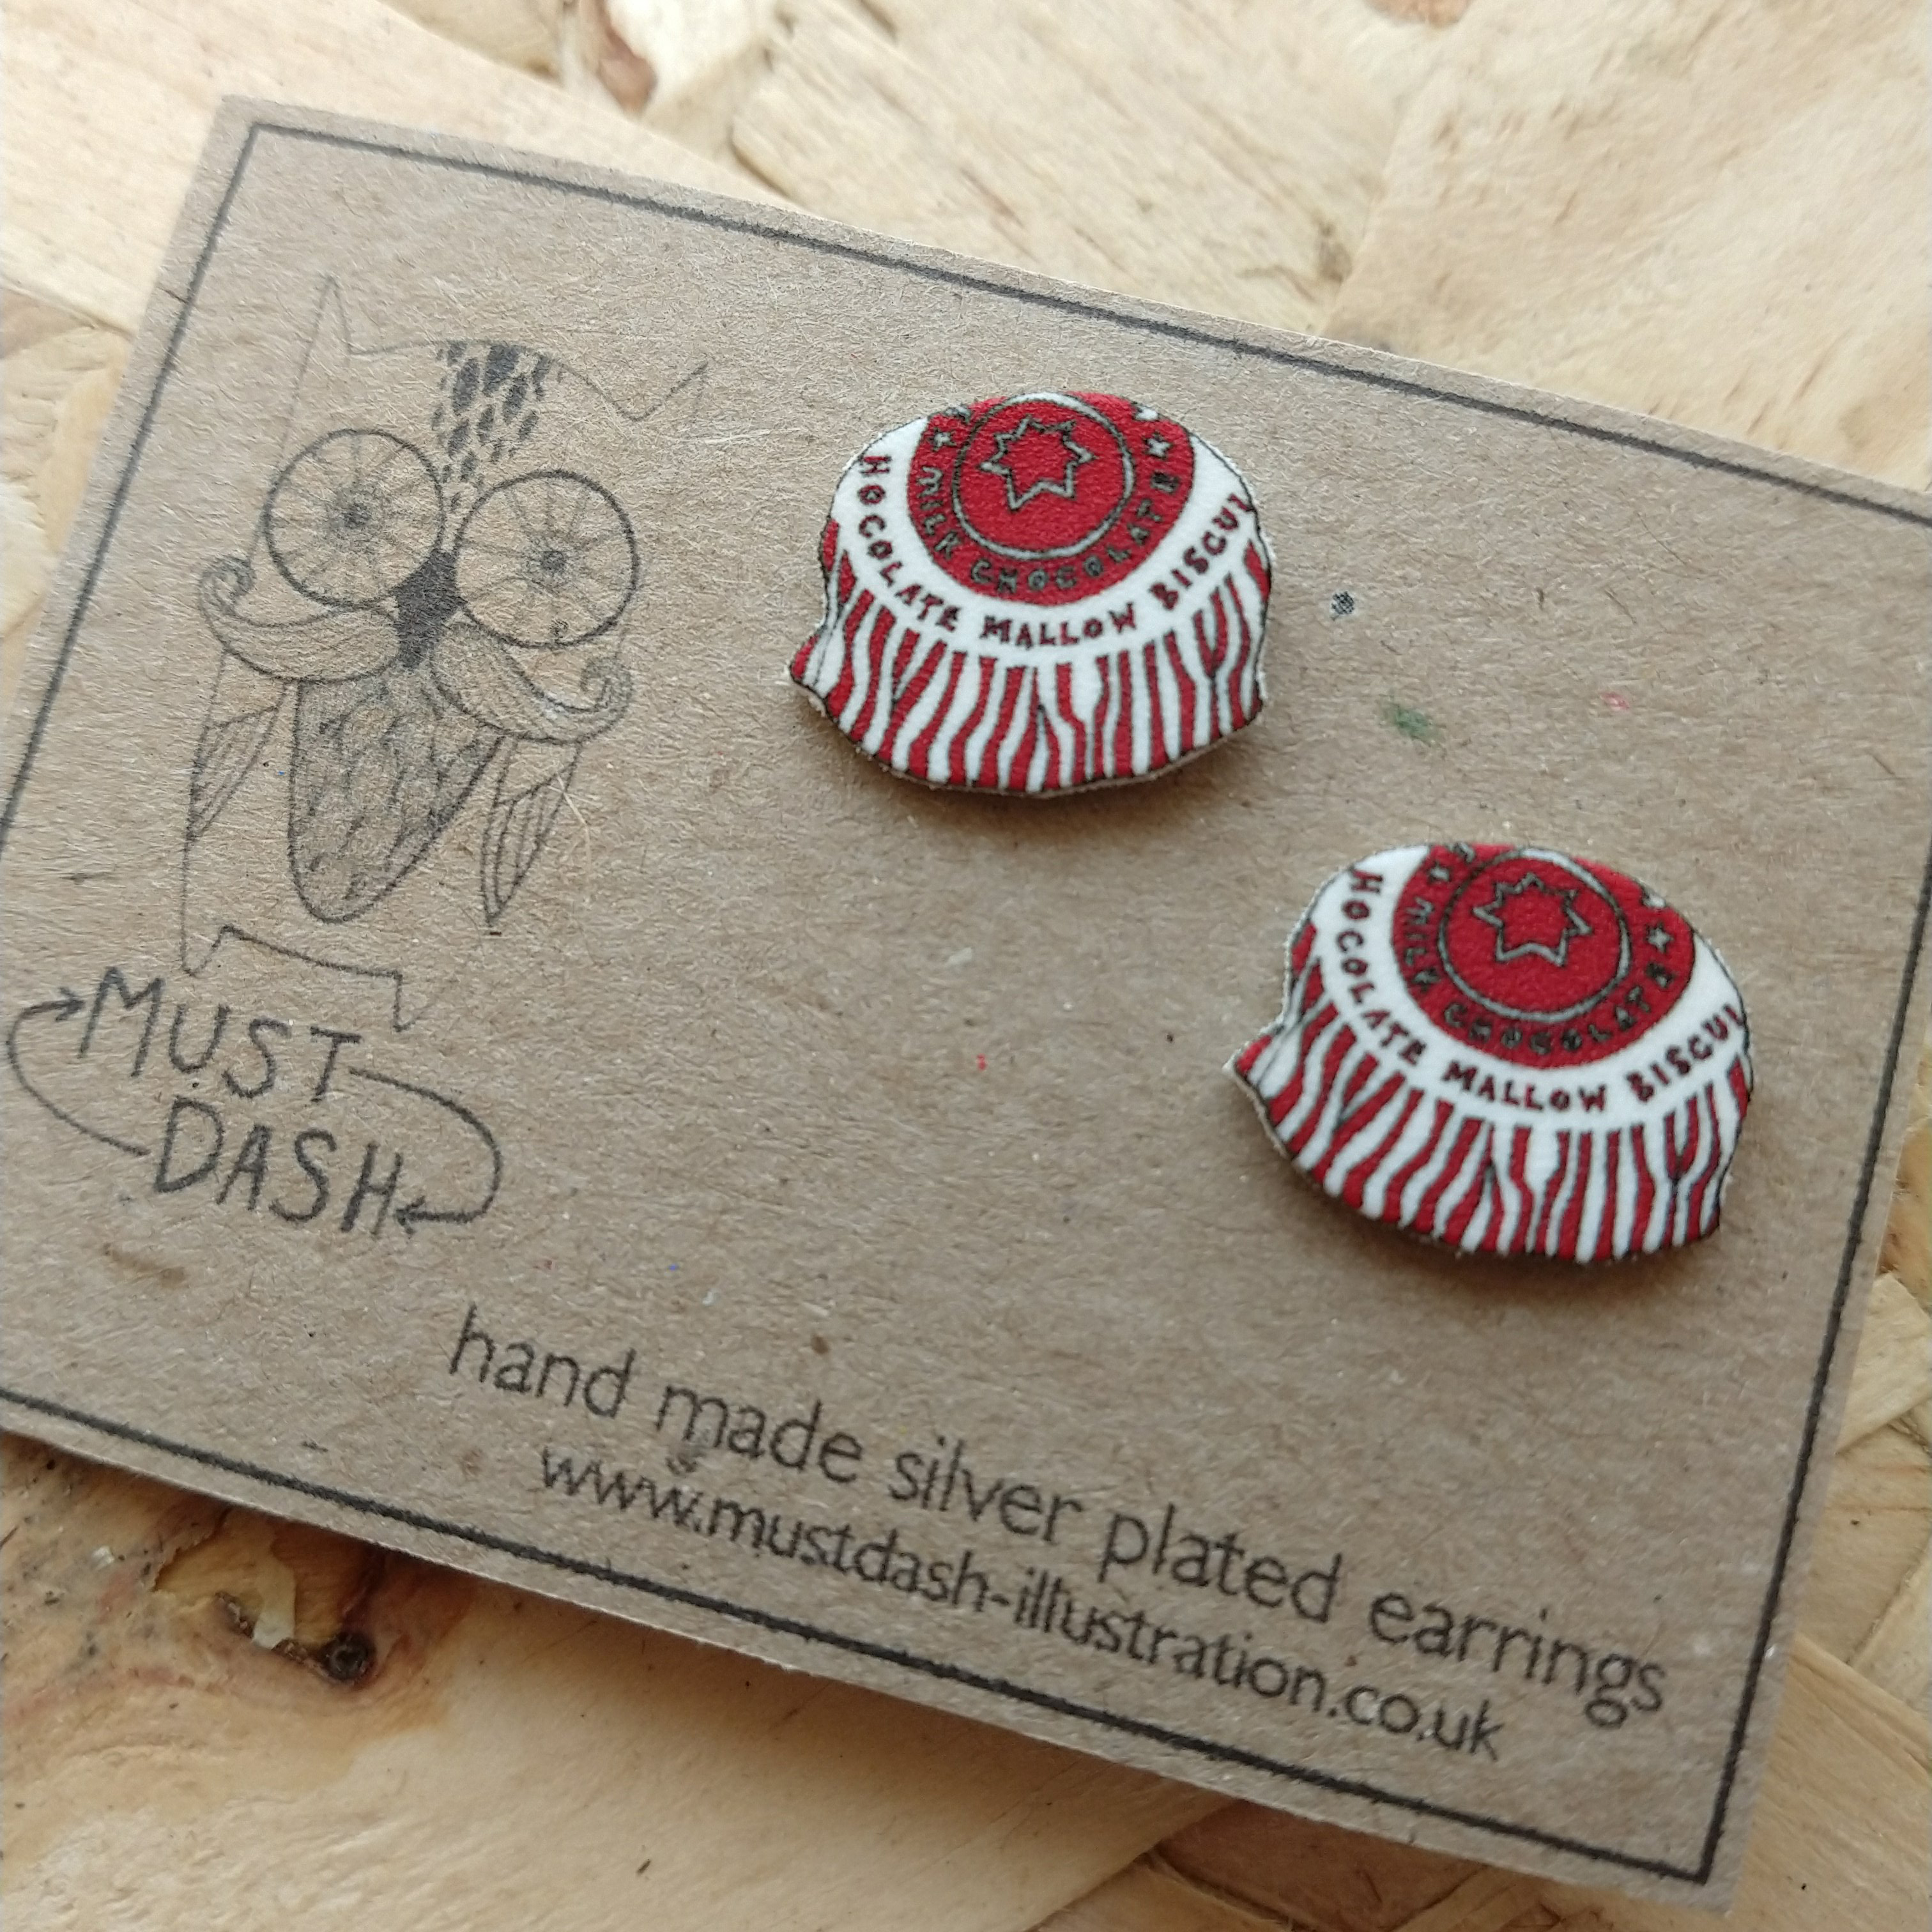 Must Dash Tea Cake Earrings